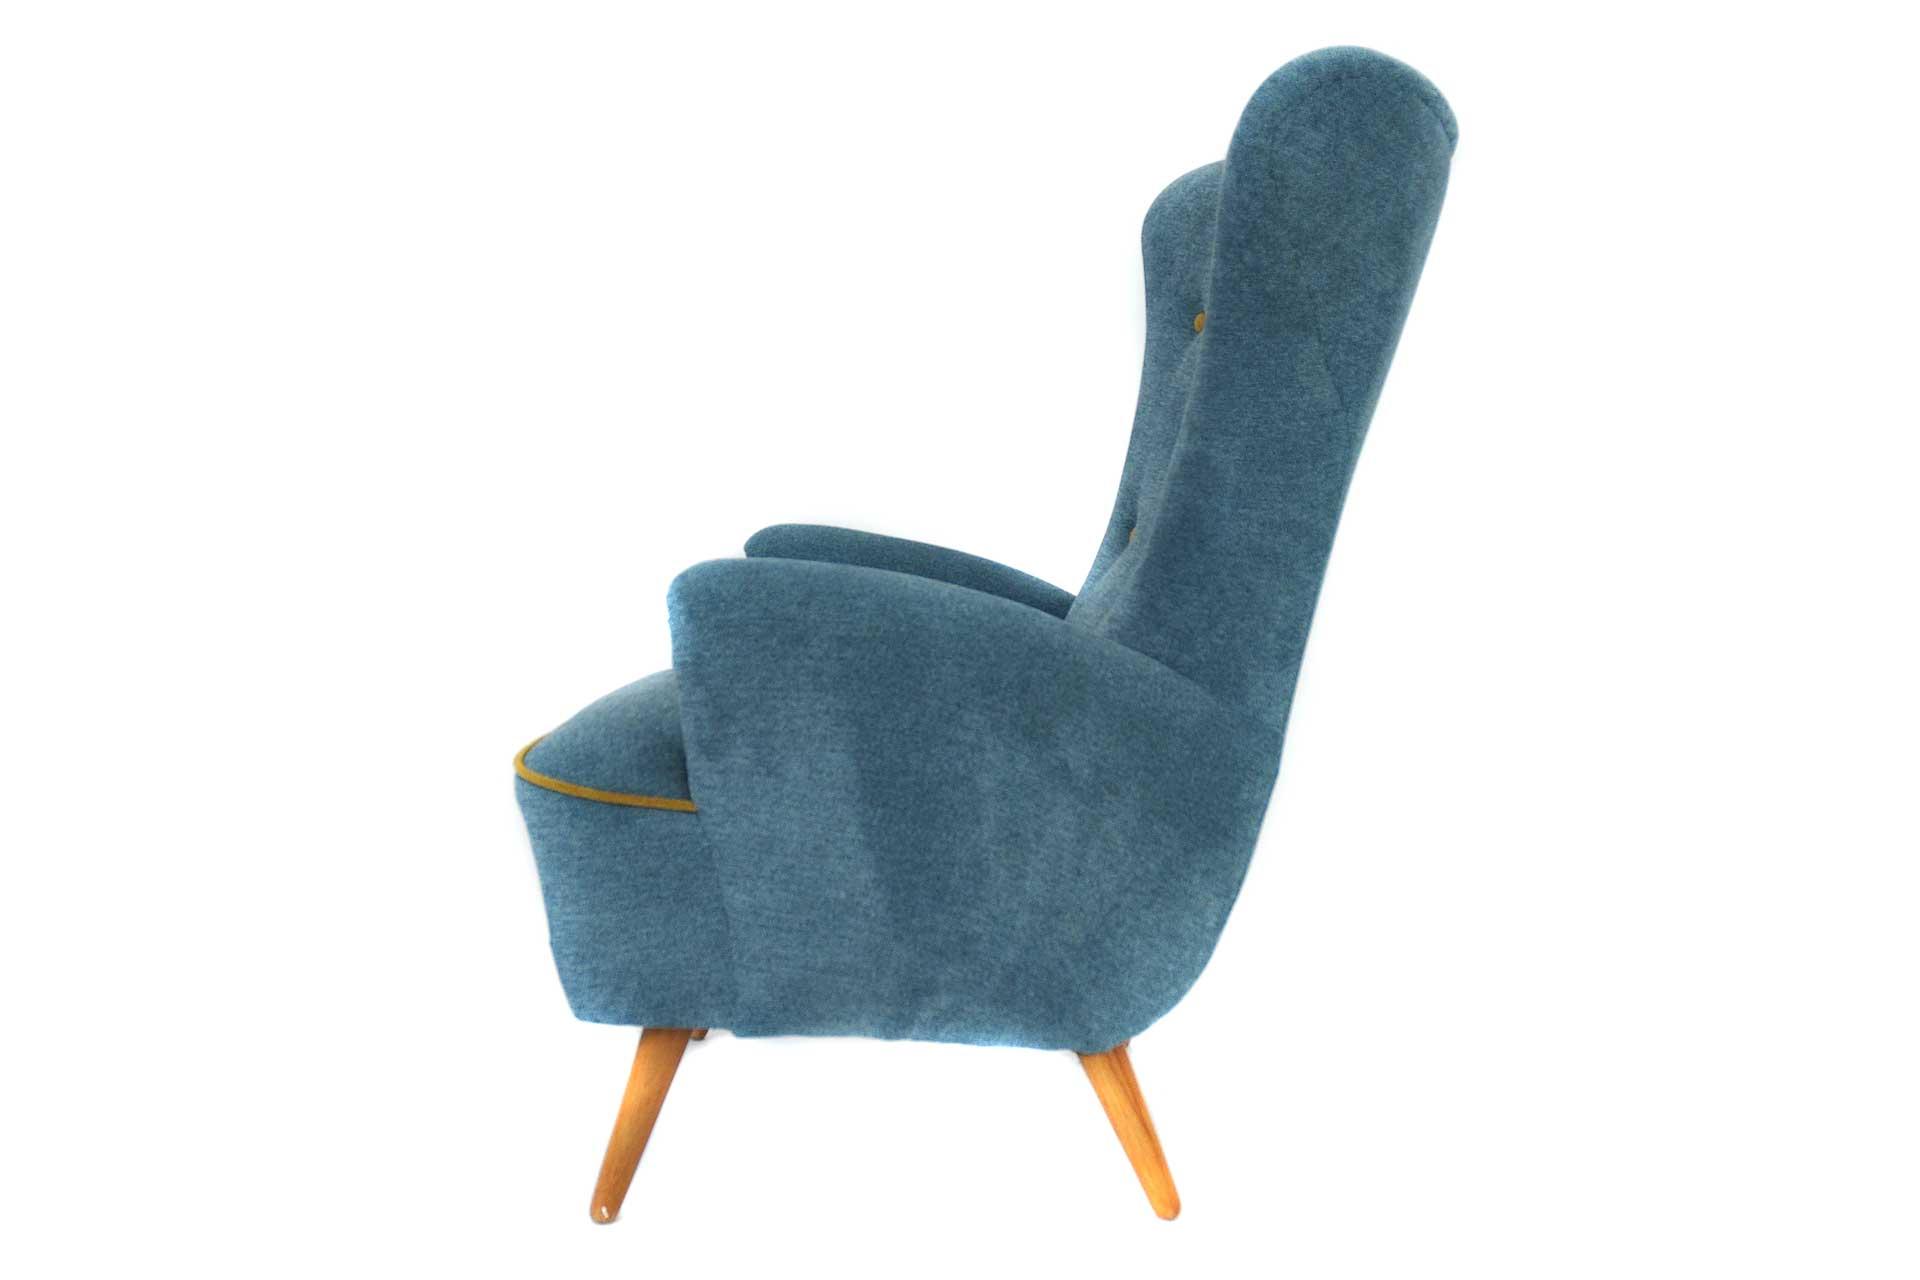 ohrensessel blau beautiful large size of ohrensessel blau. Black Bedroom Furniture Sets. Home Design Ideas